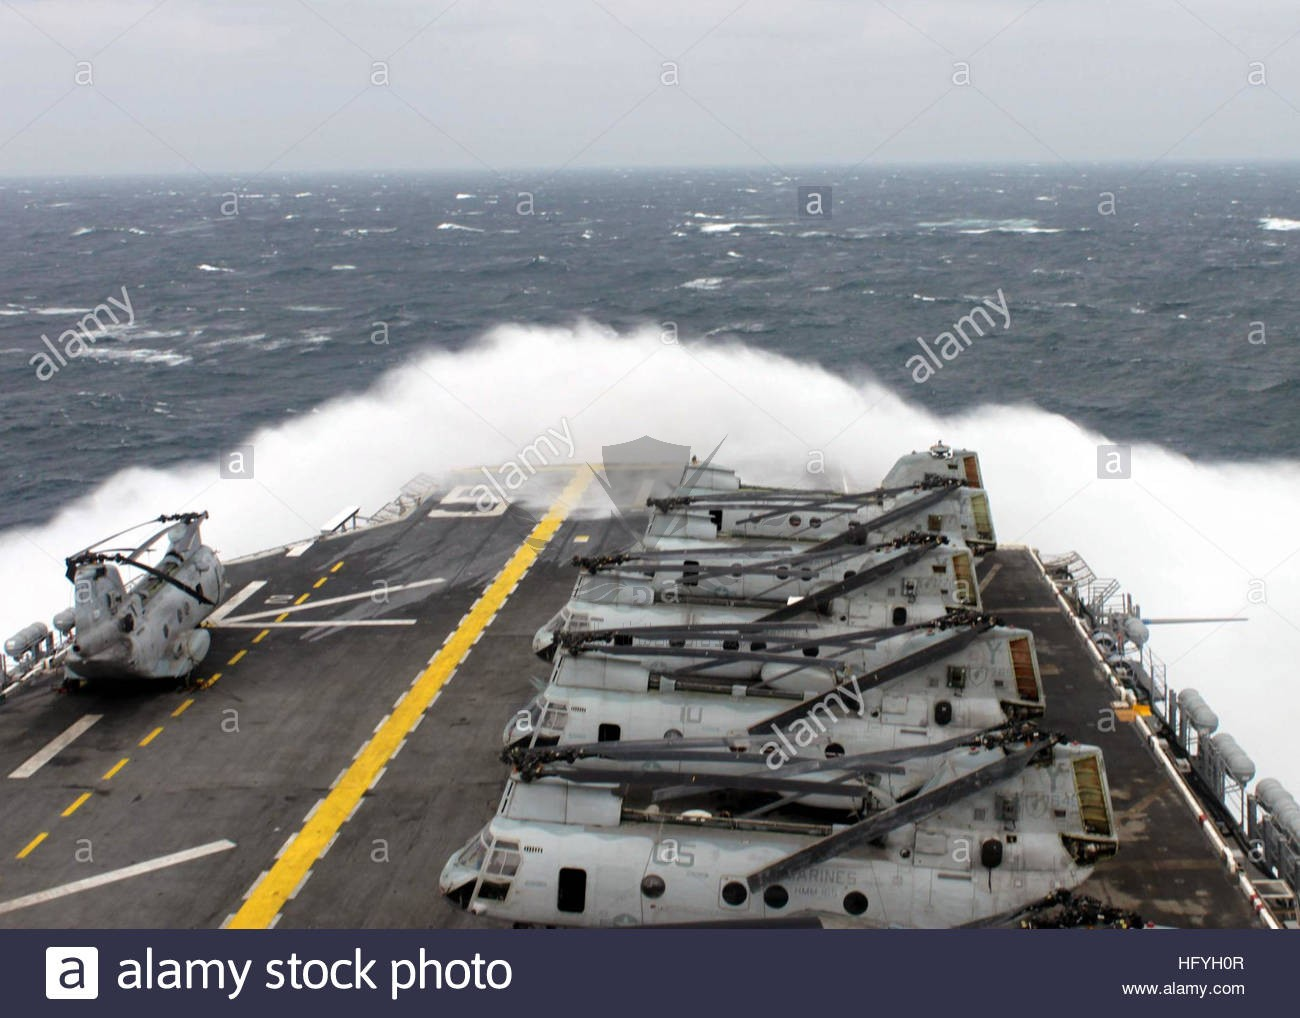 the-amphibious-assault-ship-uss-peleliu-lha-5-transits-the-south-pacific-HFYH0R.jpg